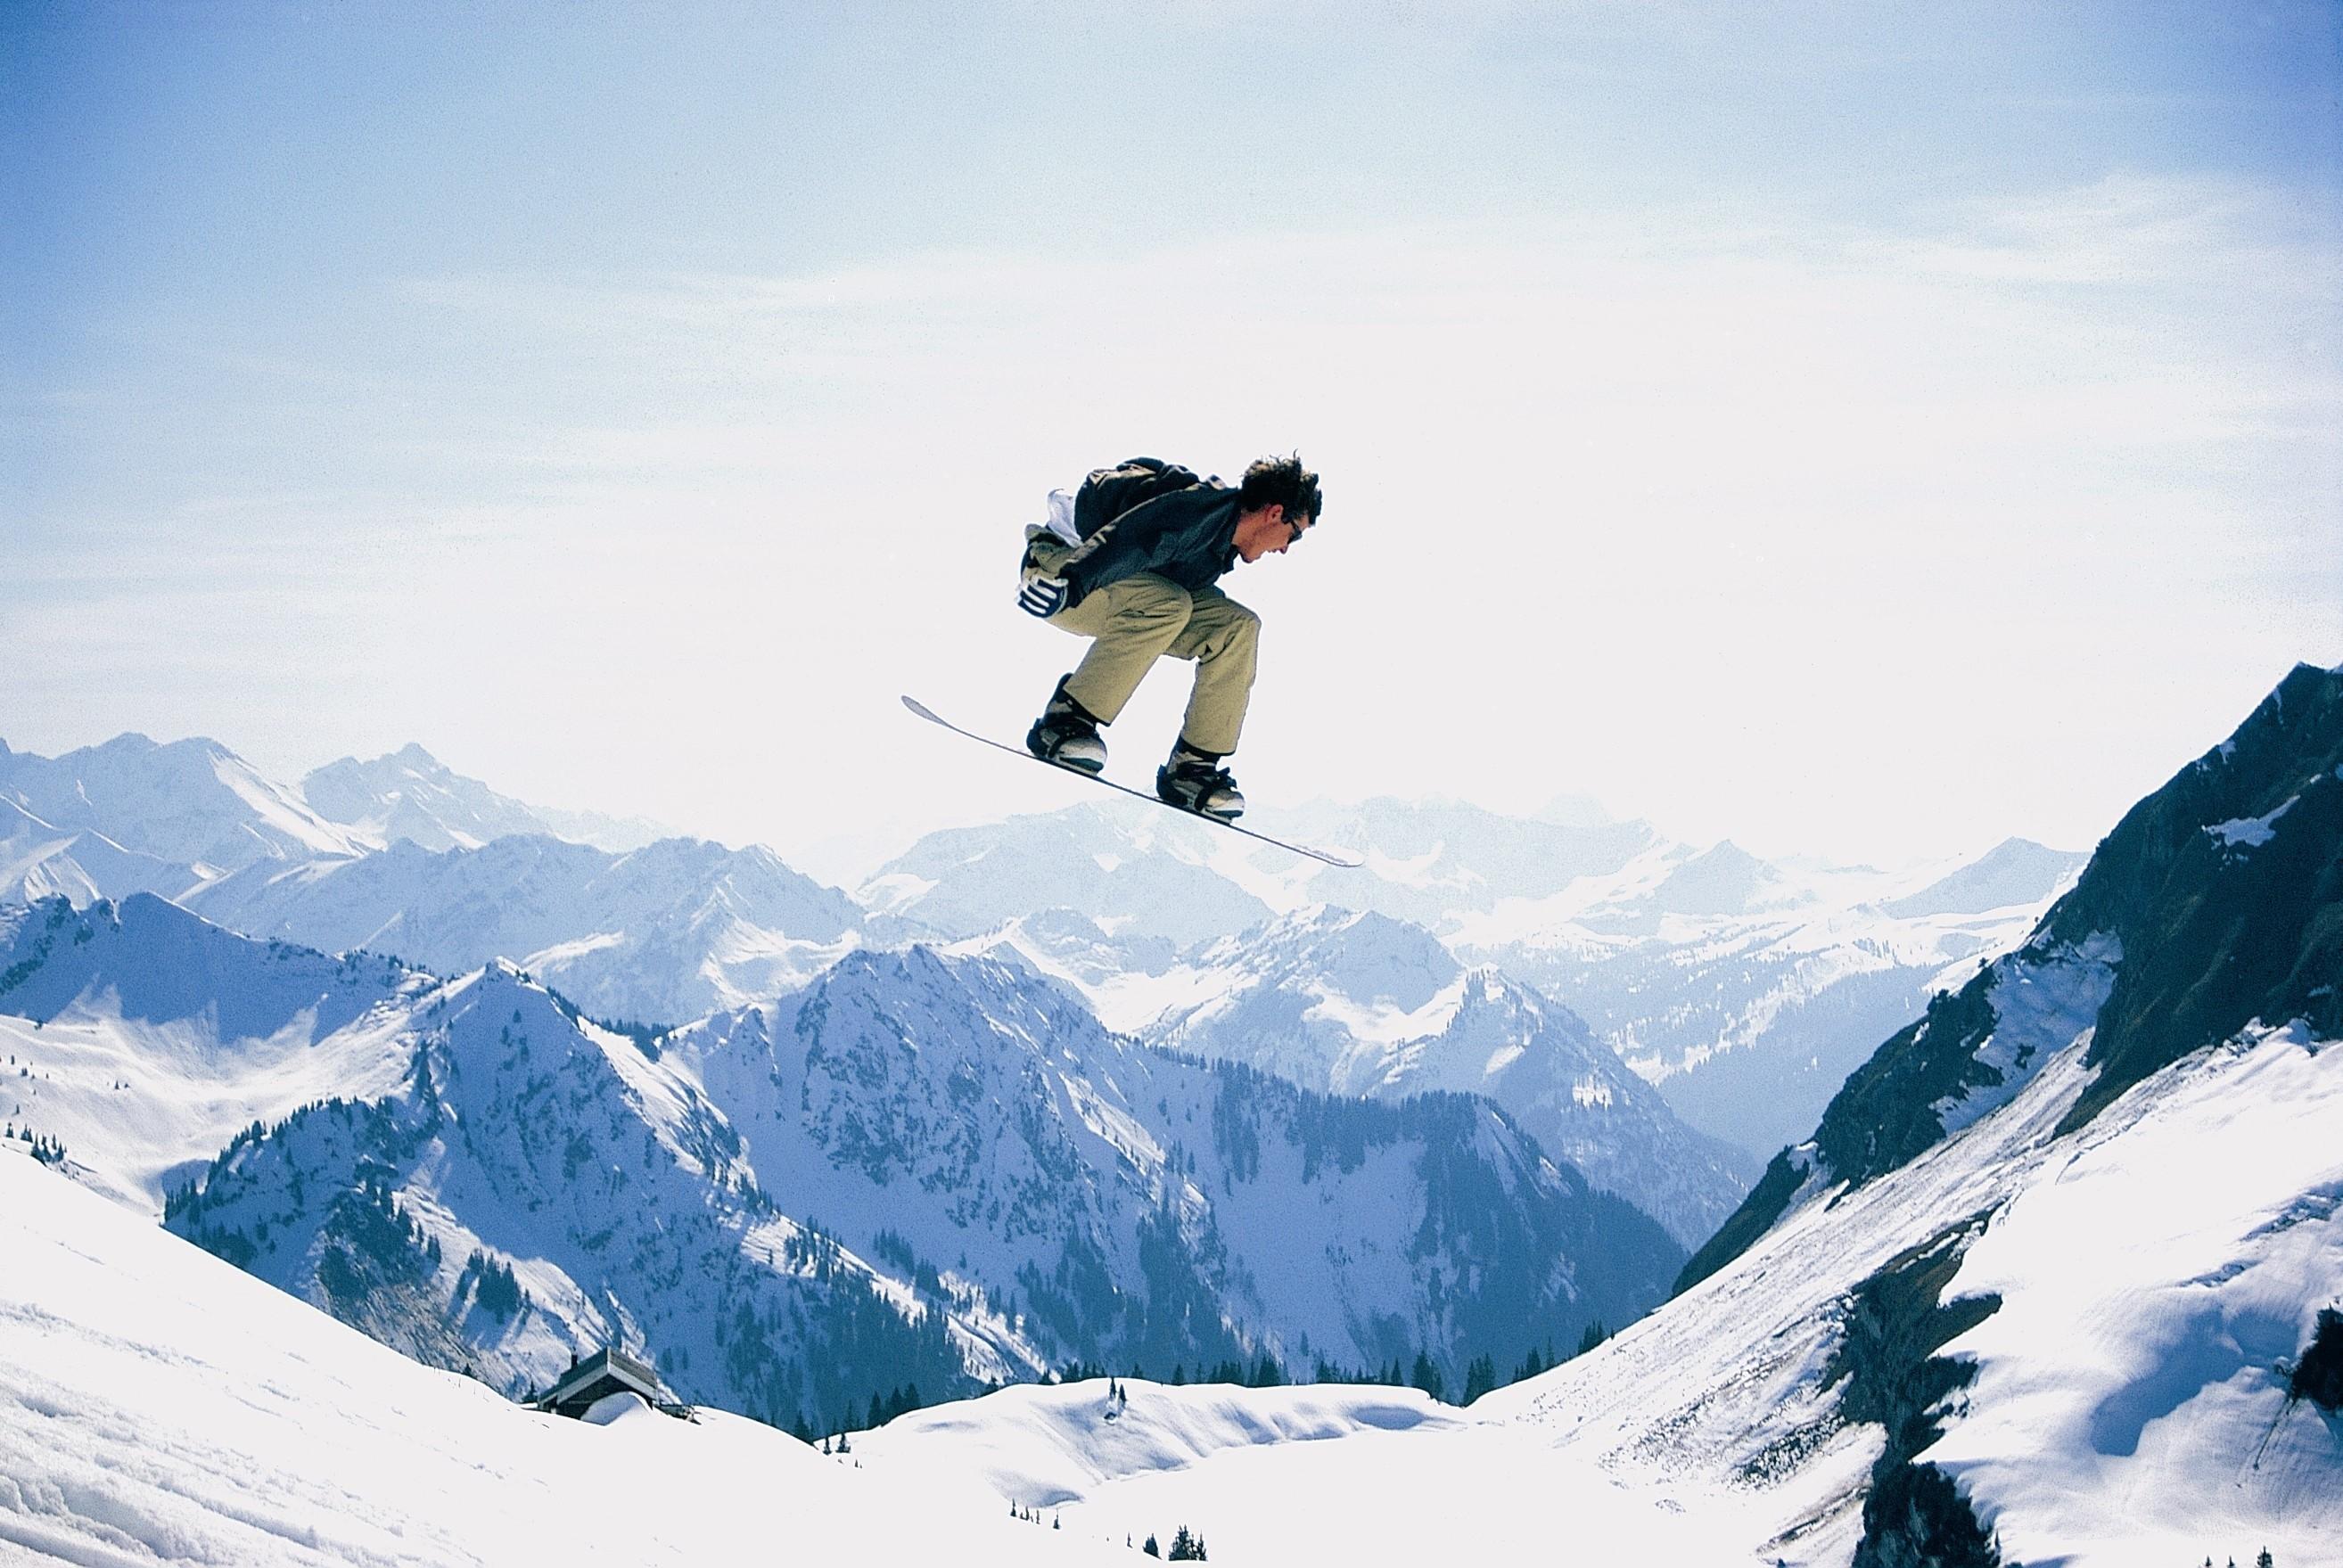 snowboard, snow, snowboarder, jump, extreme, mountais